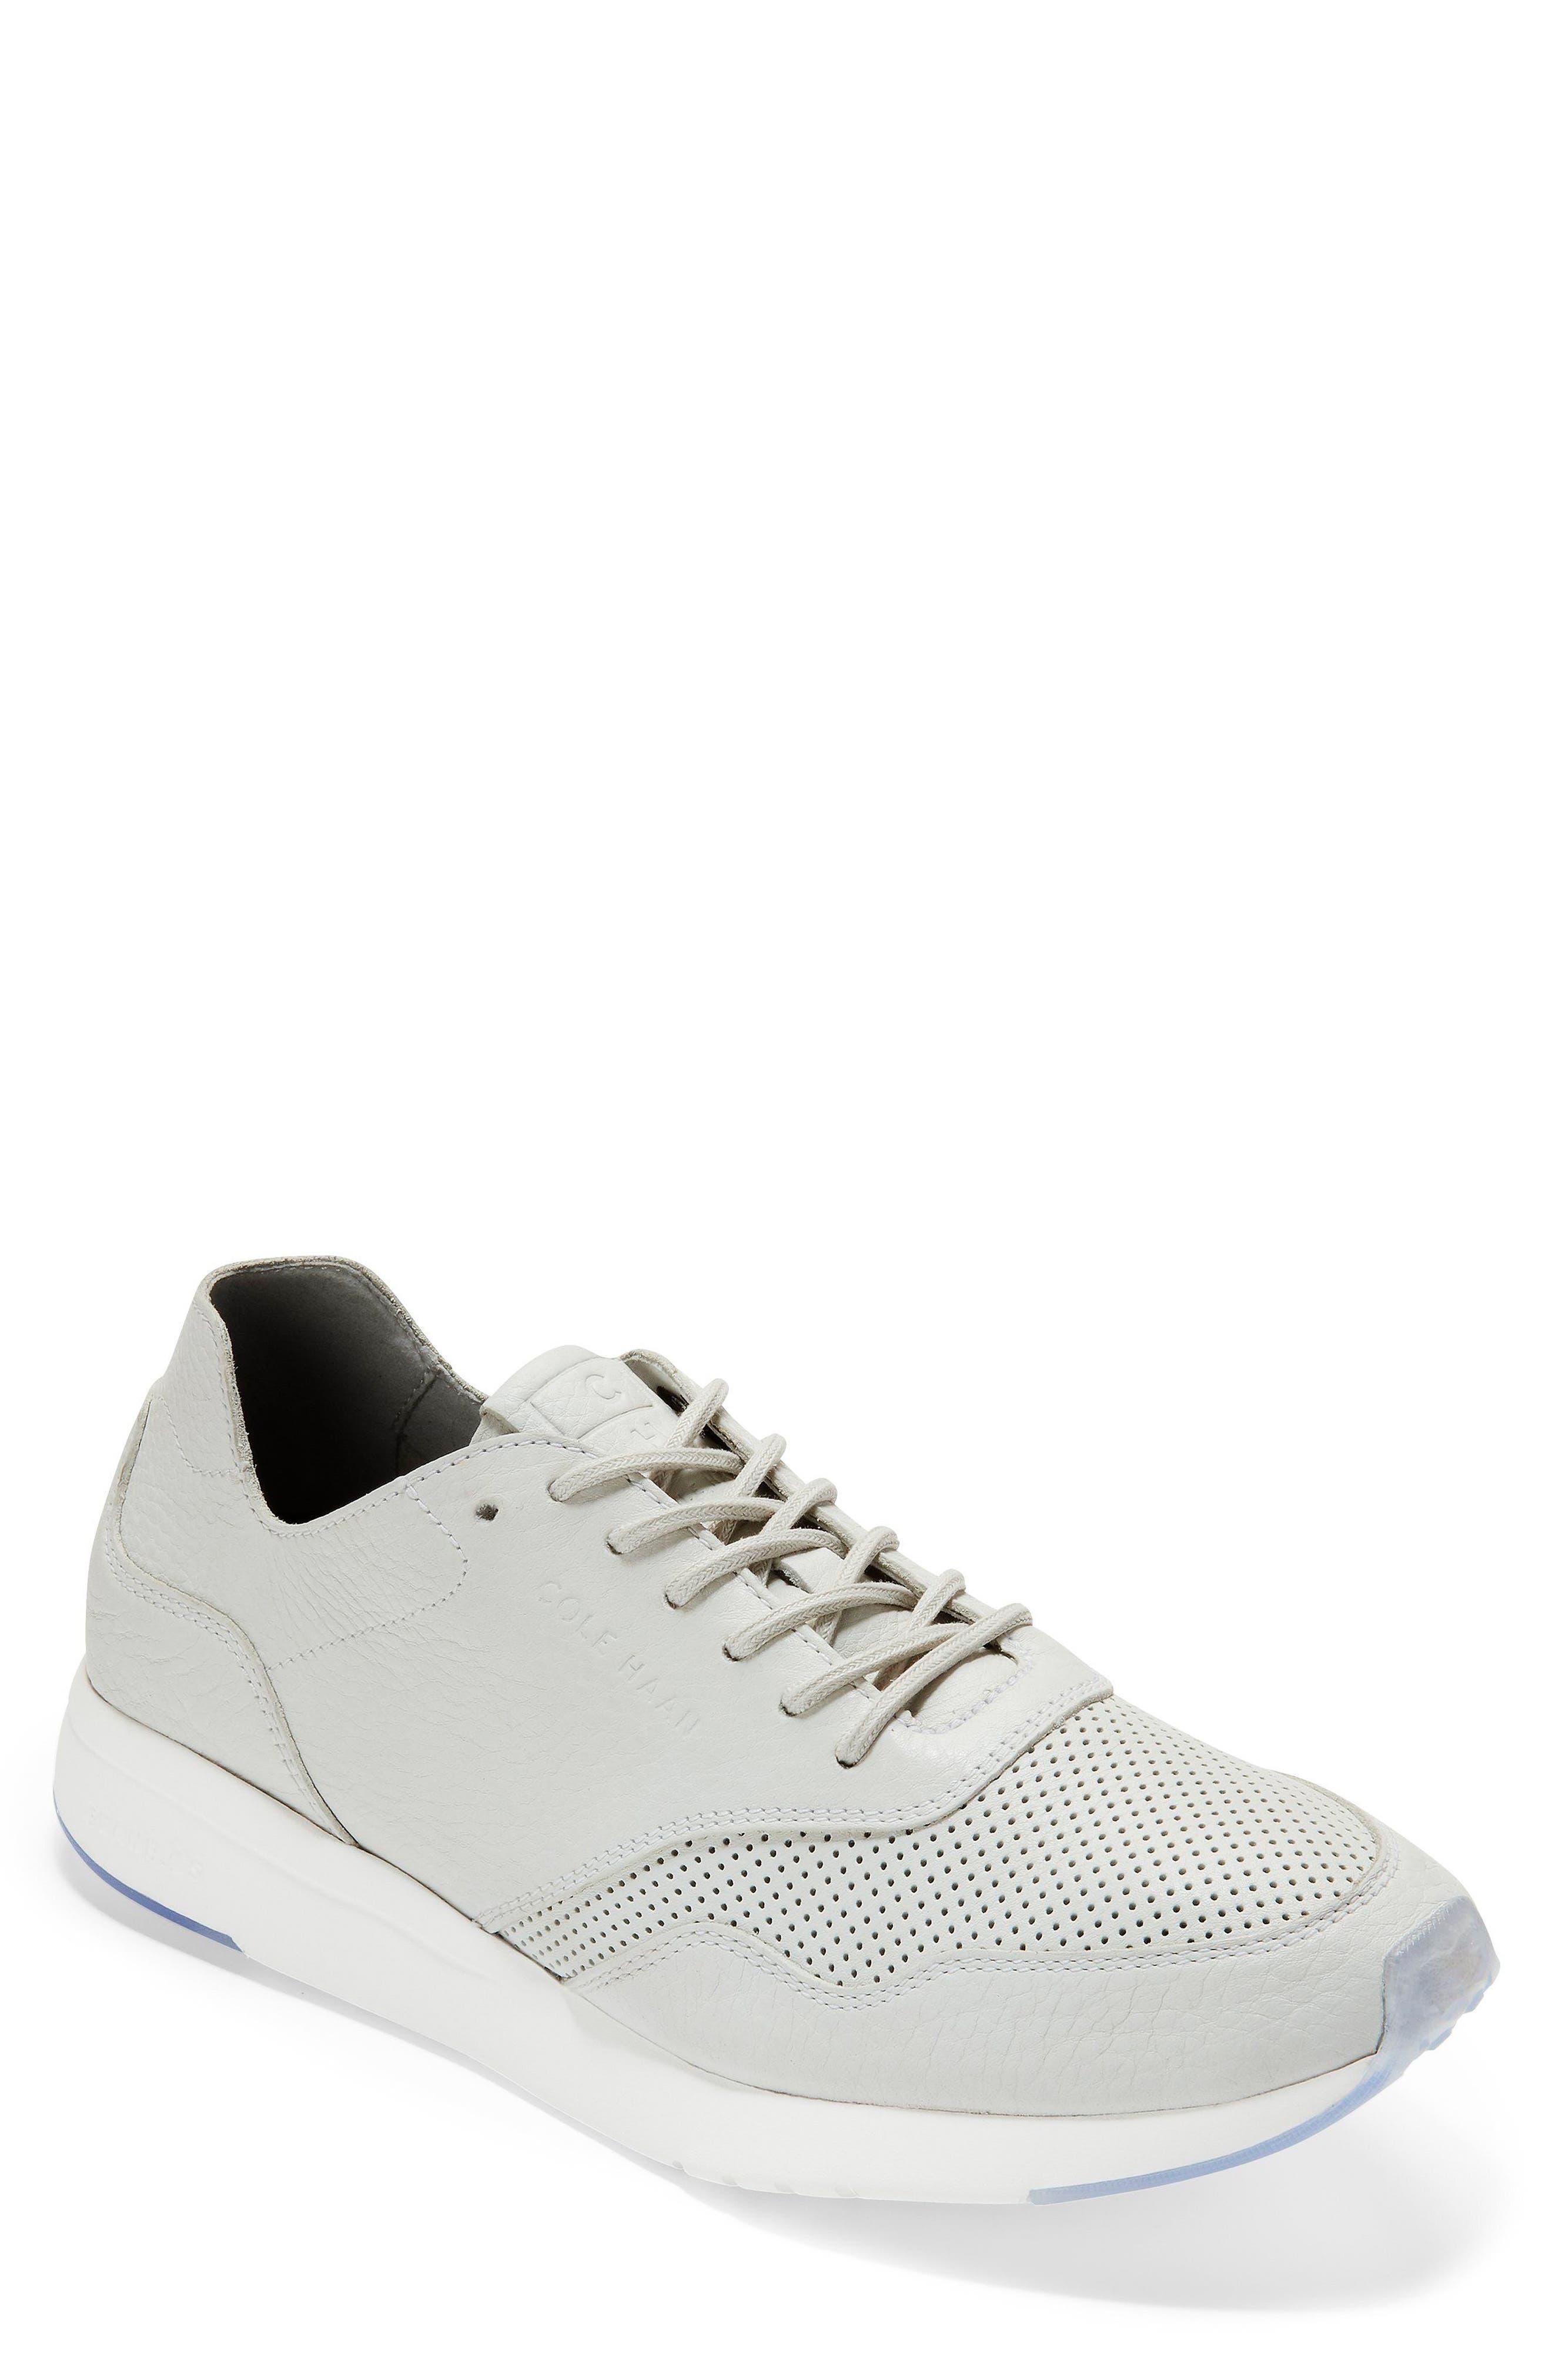 GrandPrø Deconstructed Running Sneaker,                         Main,                         color, White Leather